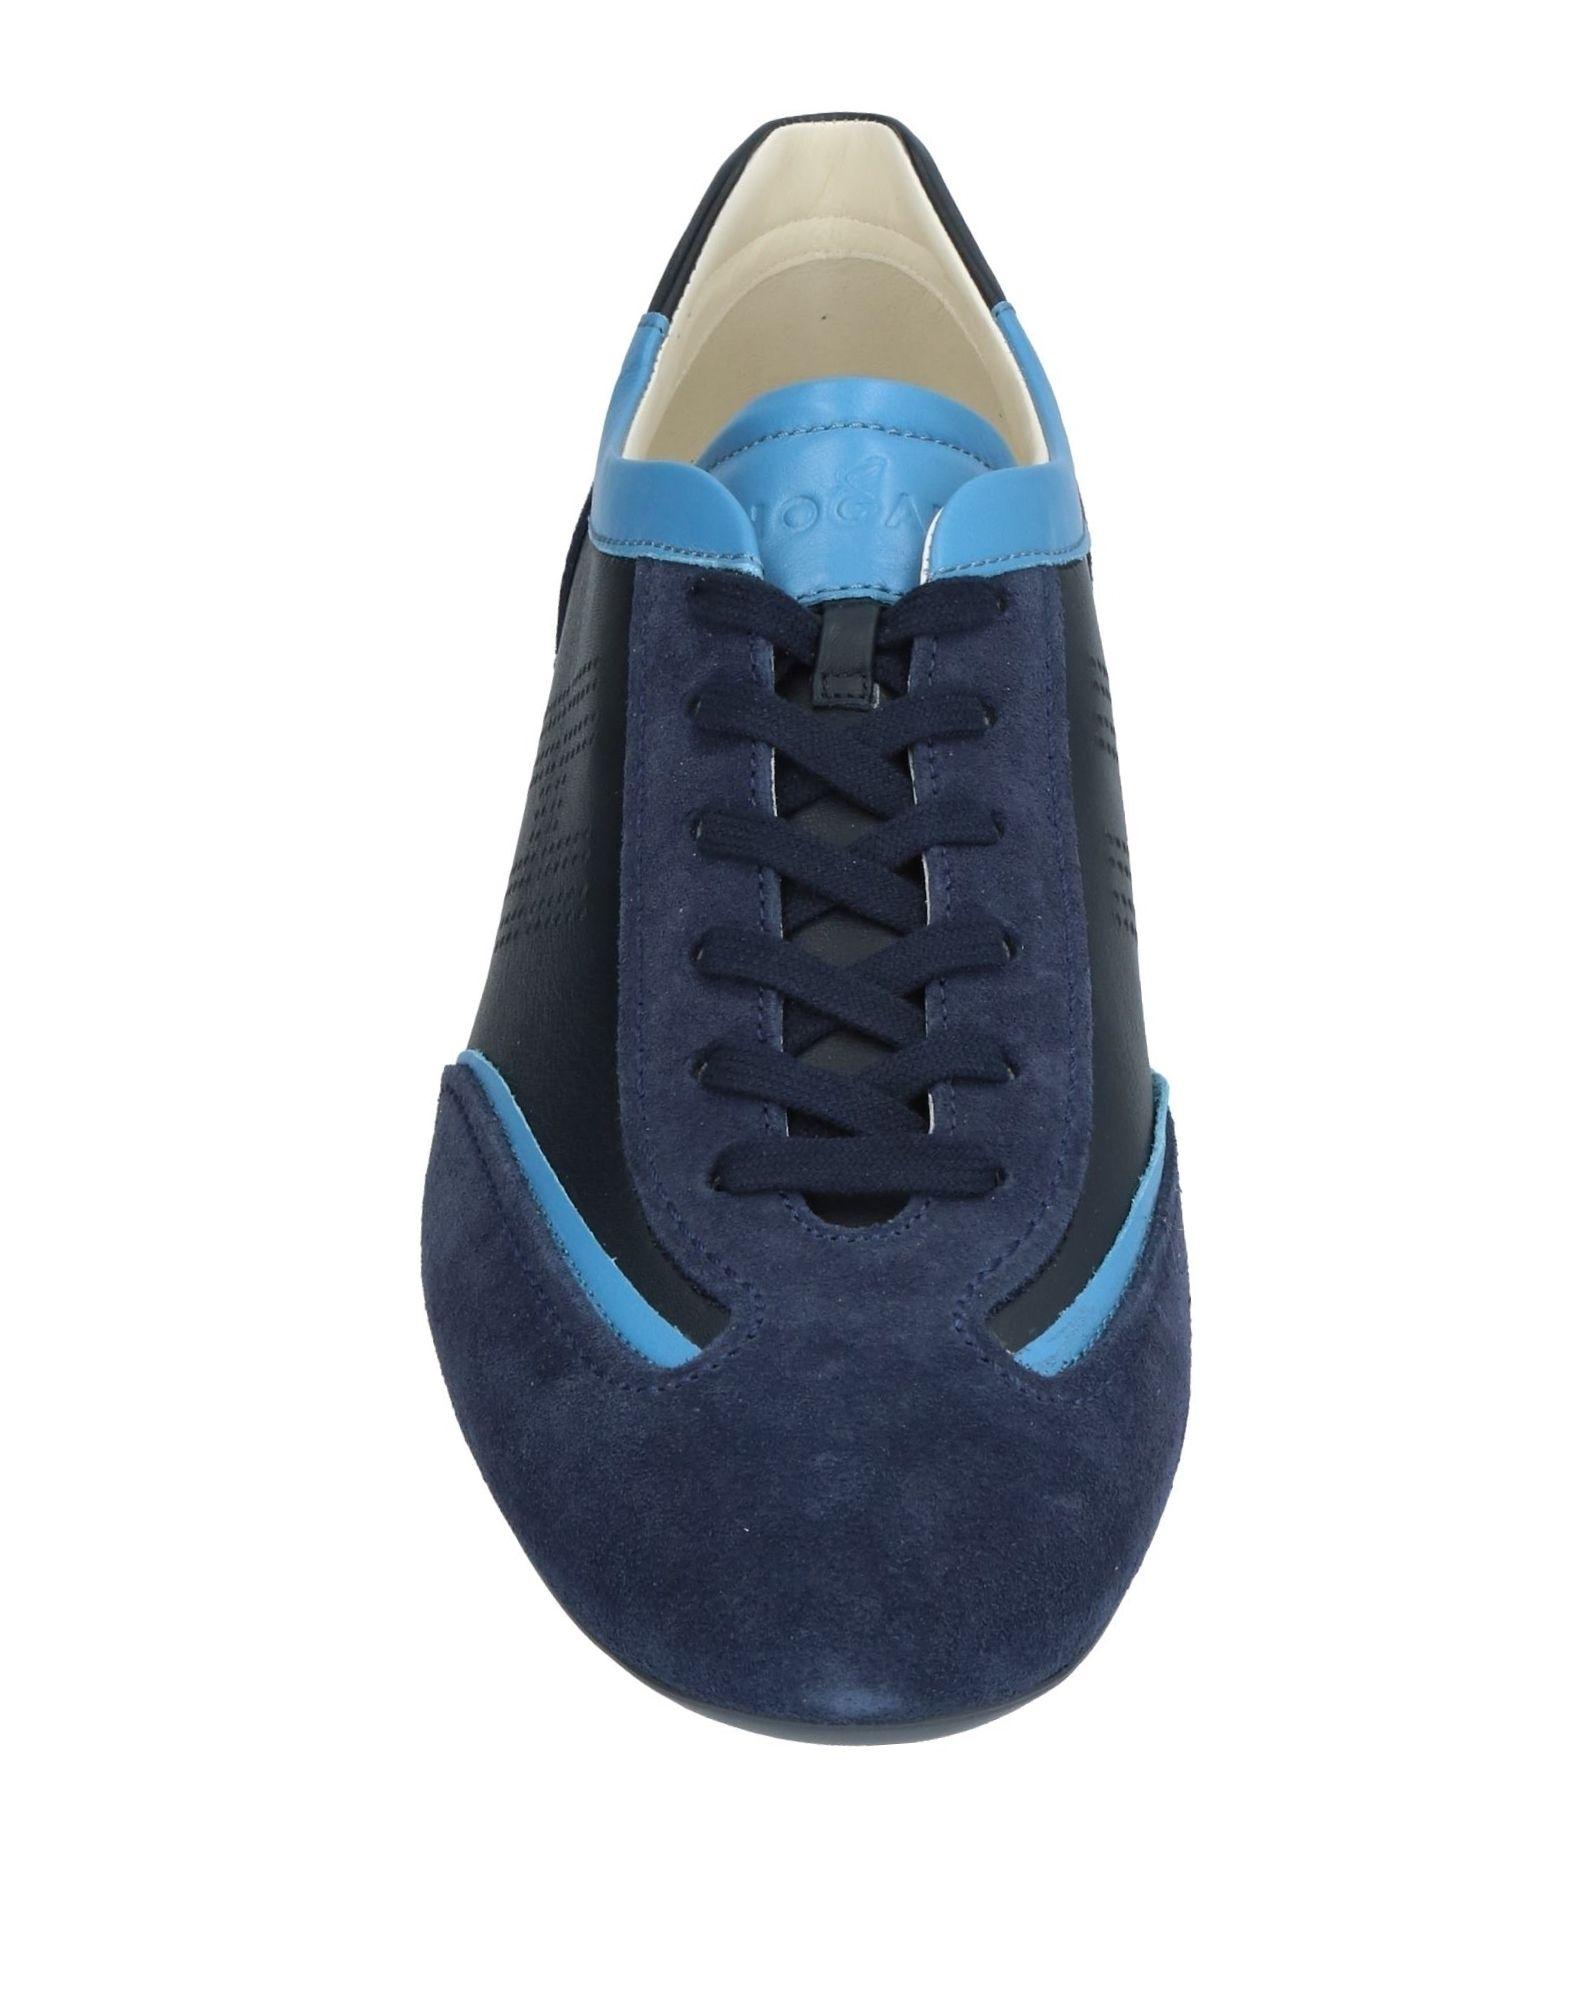 Hogan Sneakers Herren  11396940FI Gute Gute 11396940FI Qualität beliebte Schuhe 43ea27